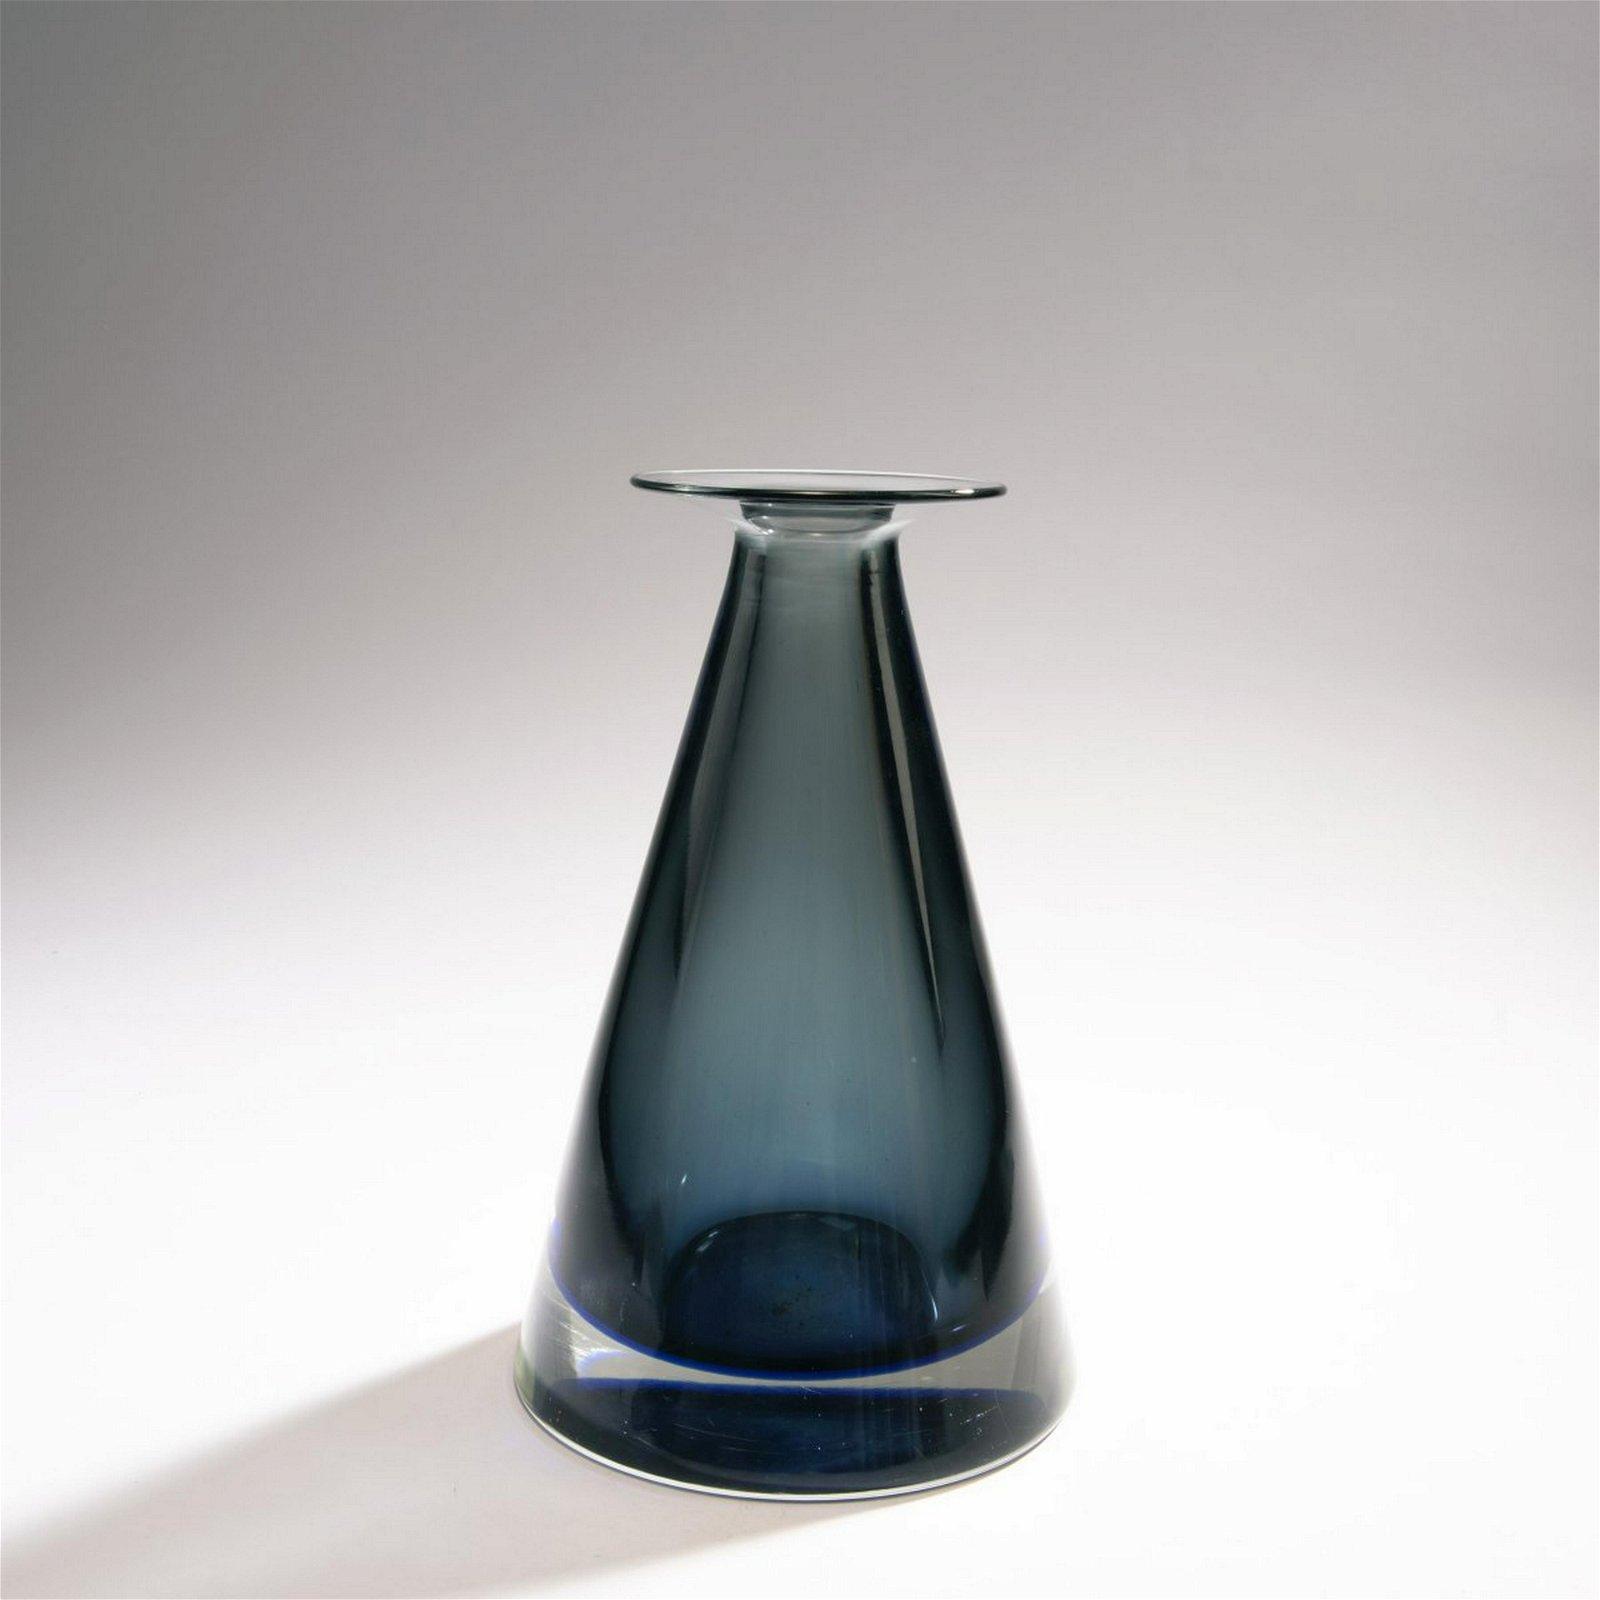 Mario Pinzoni (attr.), 'Sommerso' vase, c 1965